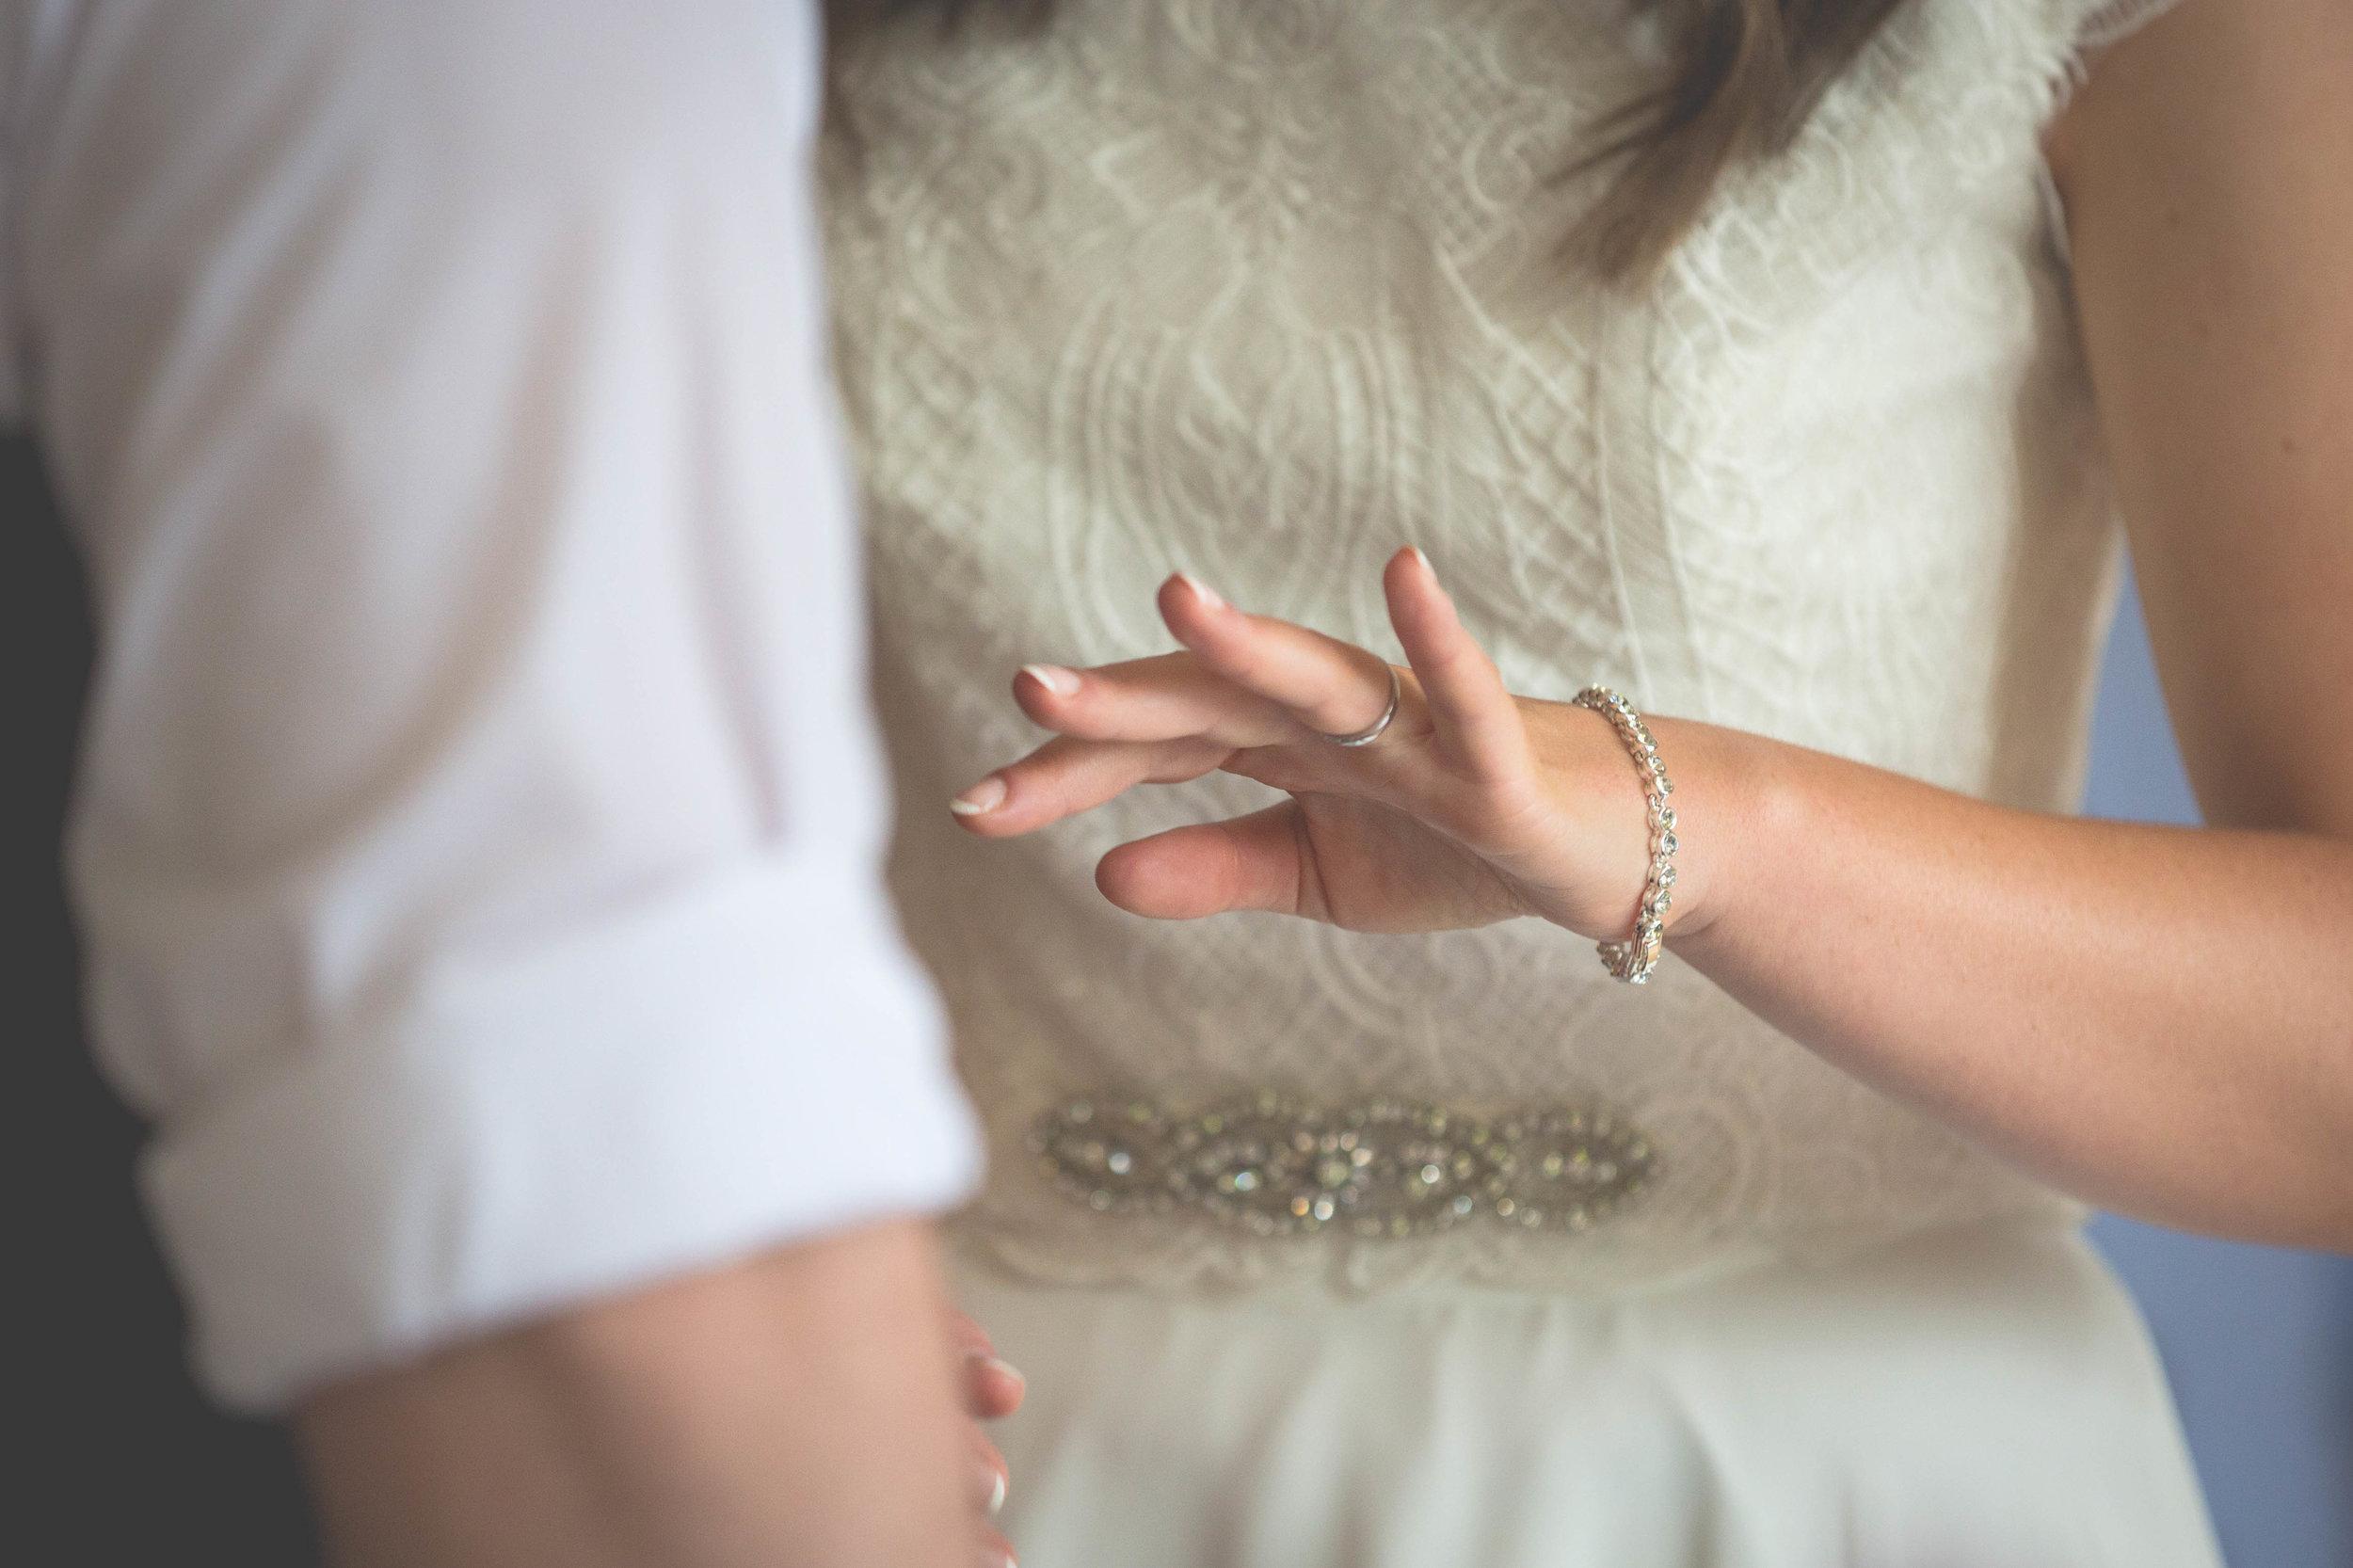 Northern Ireland Wedding Photographer | Brian McEwan Photography | Affordable Wedding Photography Throughout Antrim Down Armagh Tyrone Londonderry Derry Down Fermanagh -2.jpg